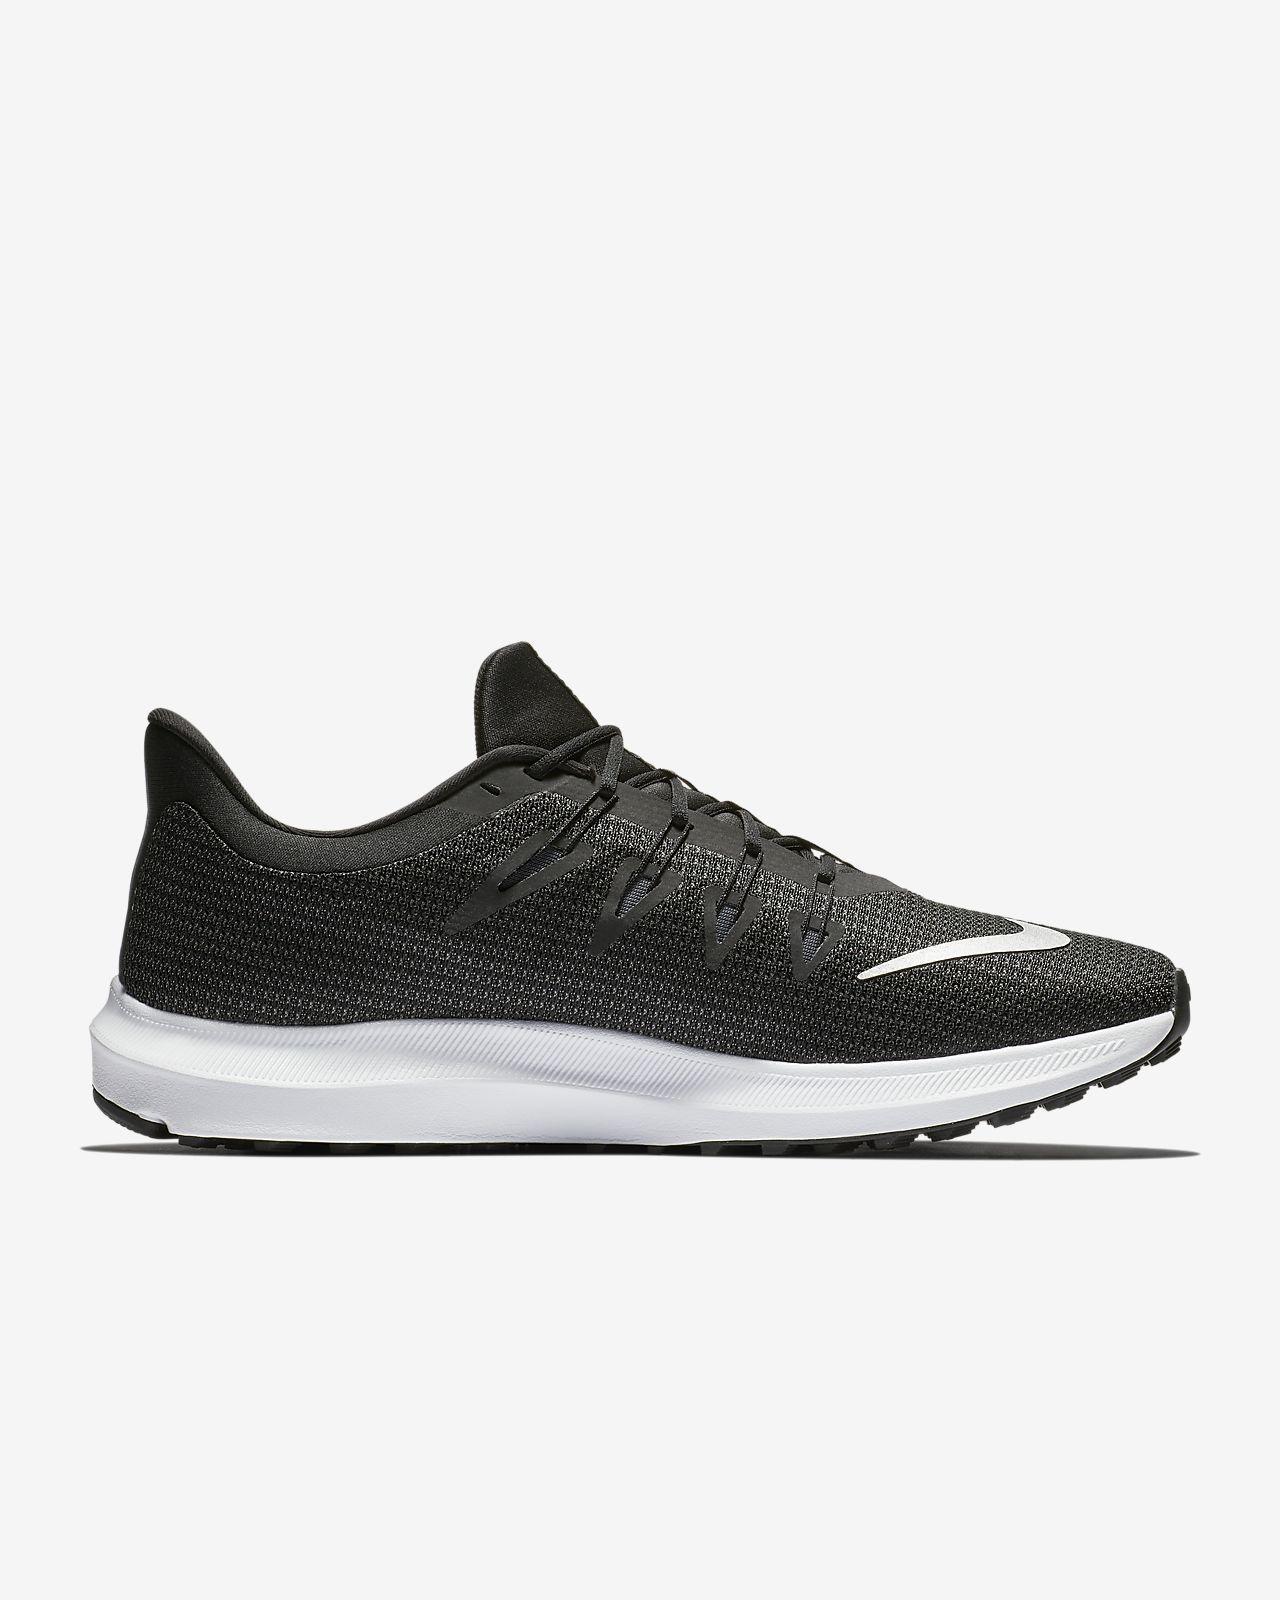 quality design 9f07b 6b94c ... Chaussure de running Nike Quest pour Homme